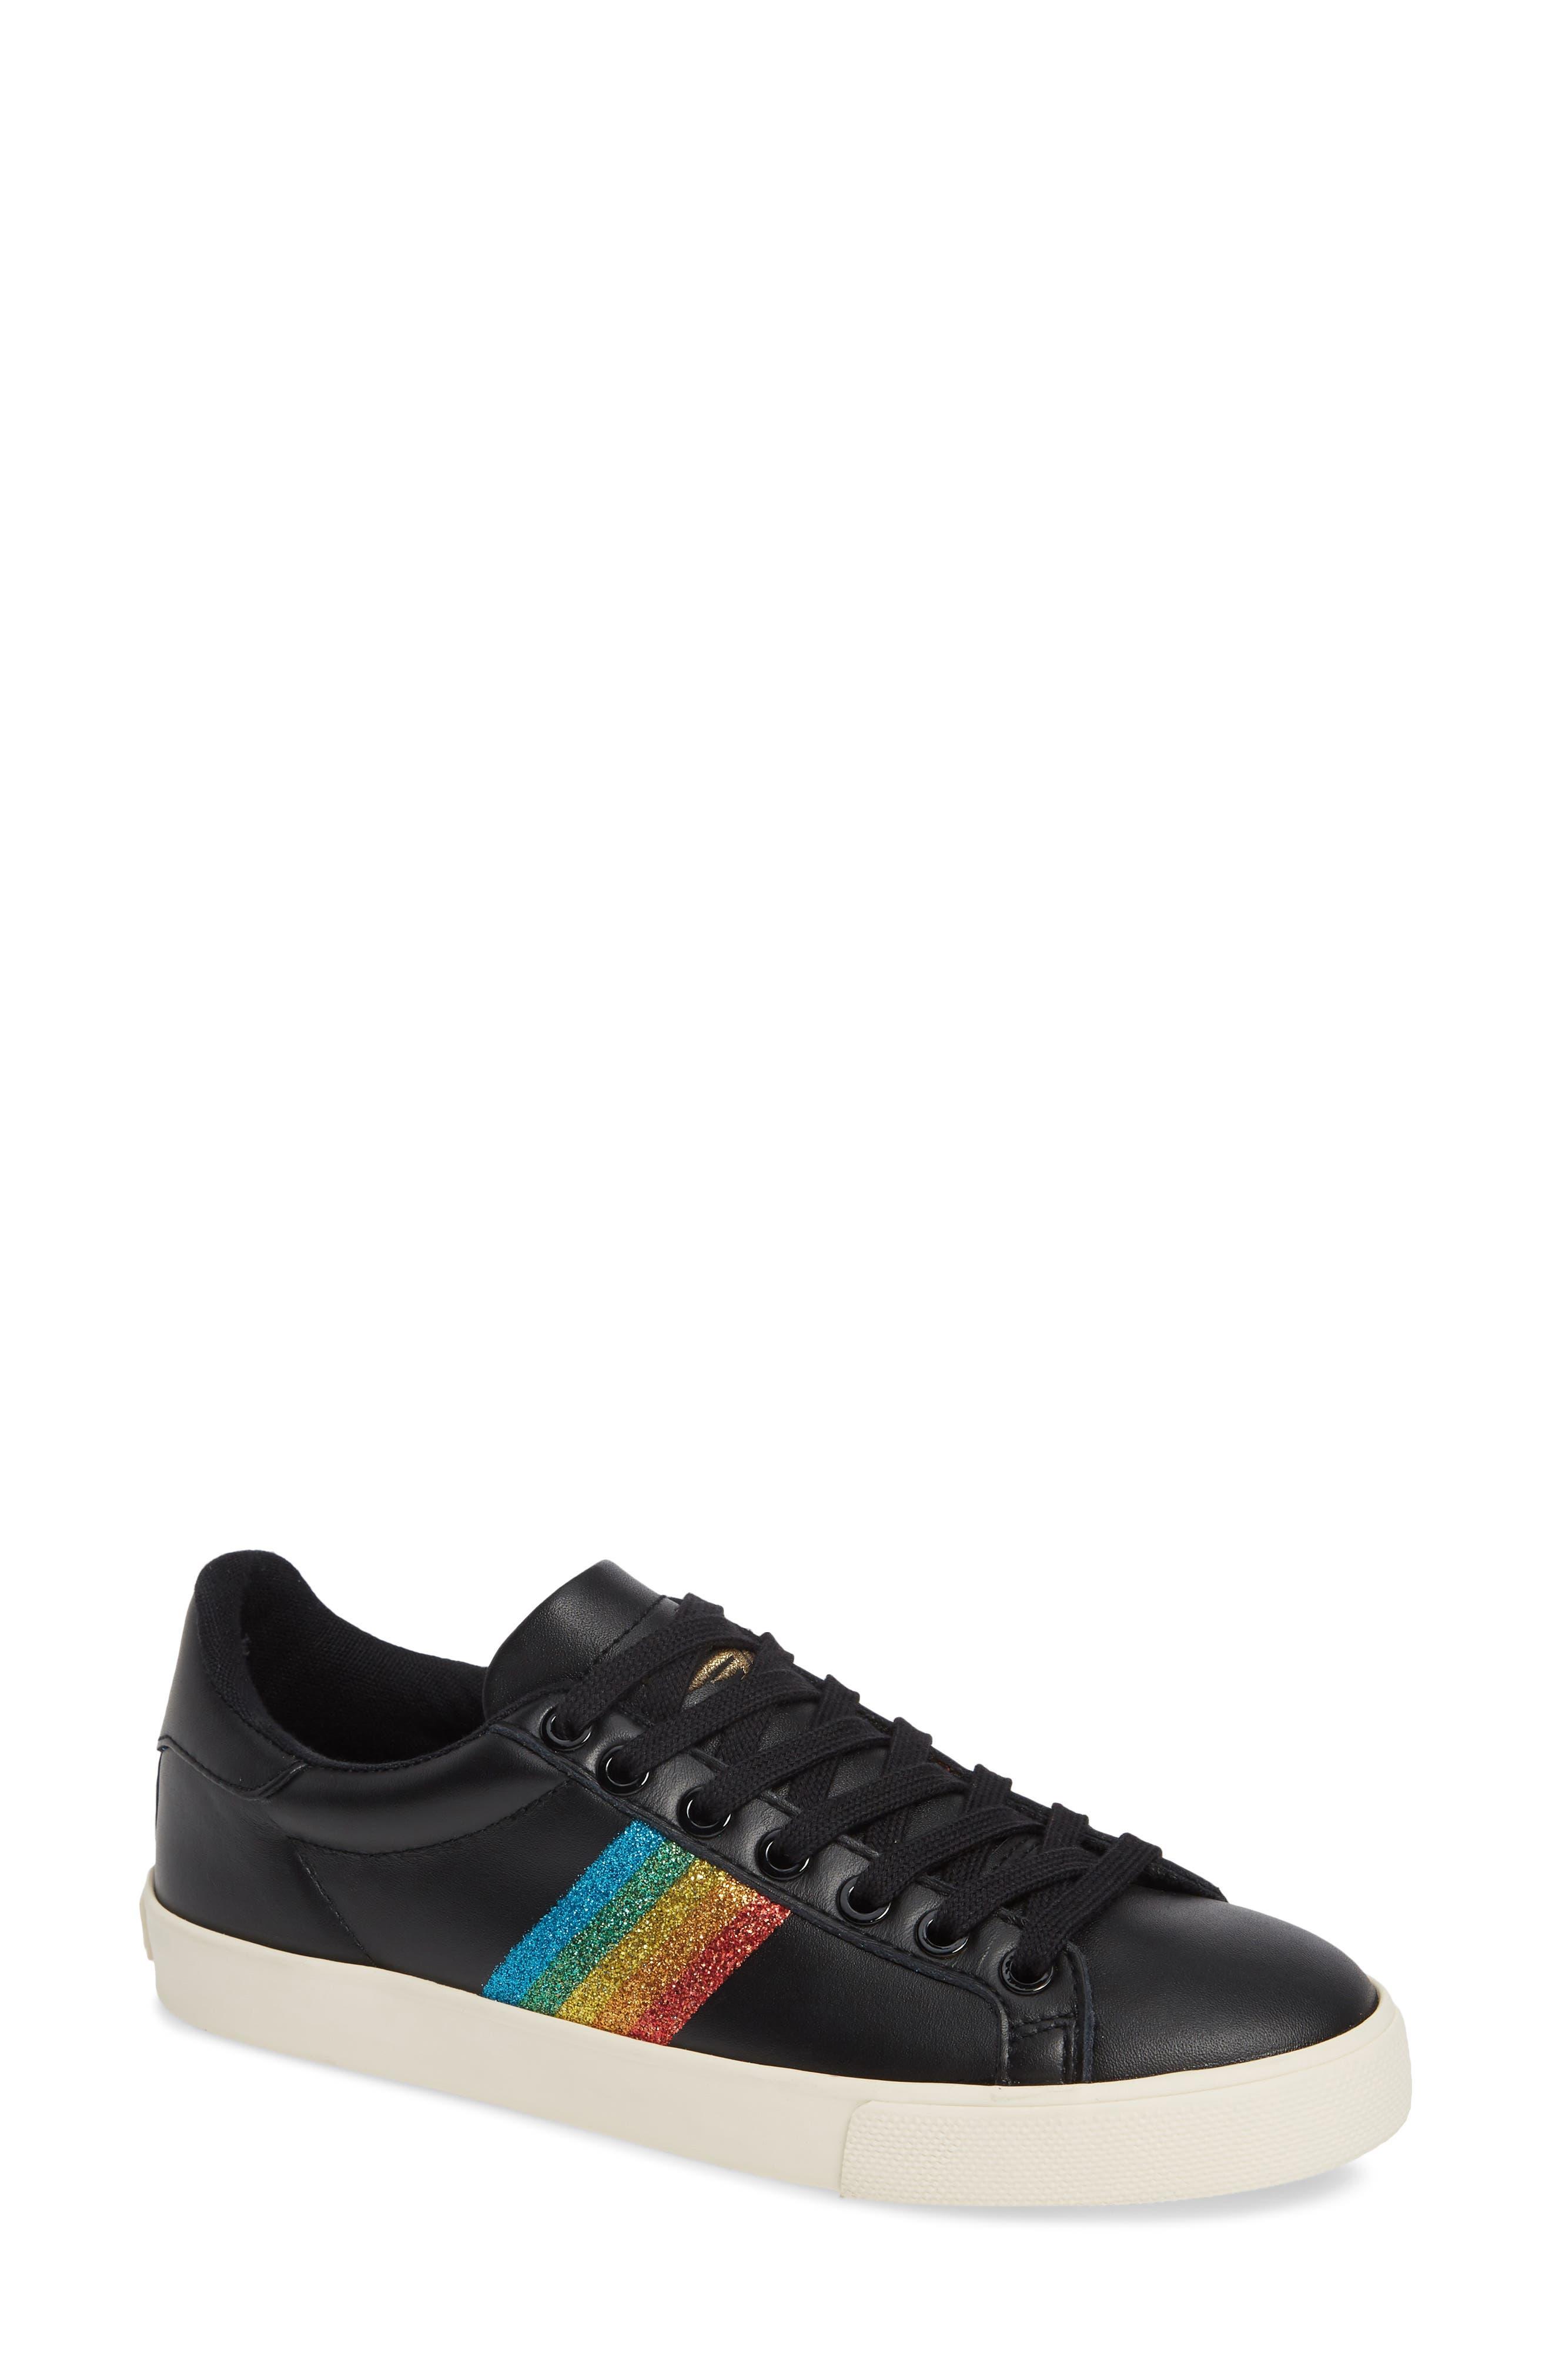 Gola Orchid Rainbow Glitter Sneaker